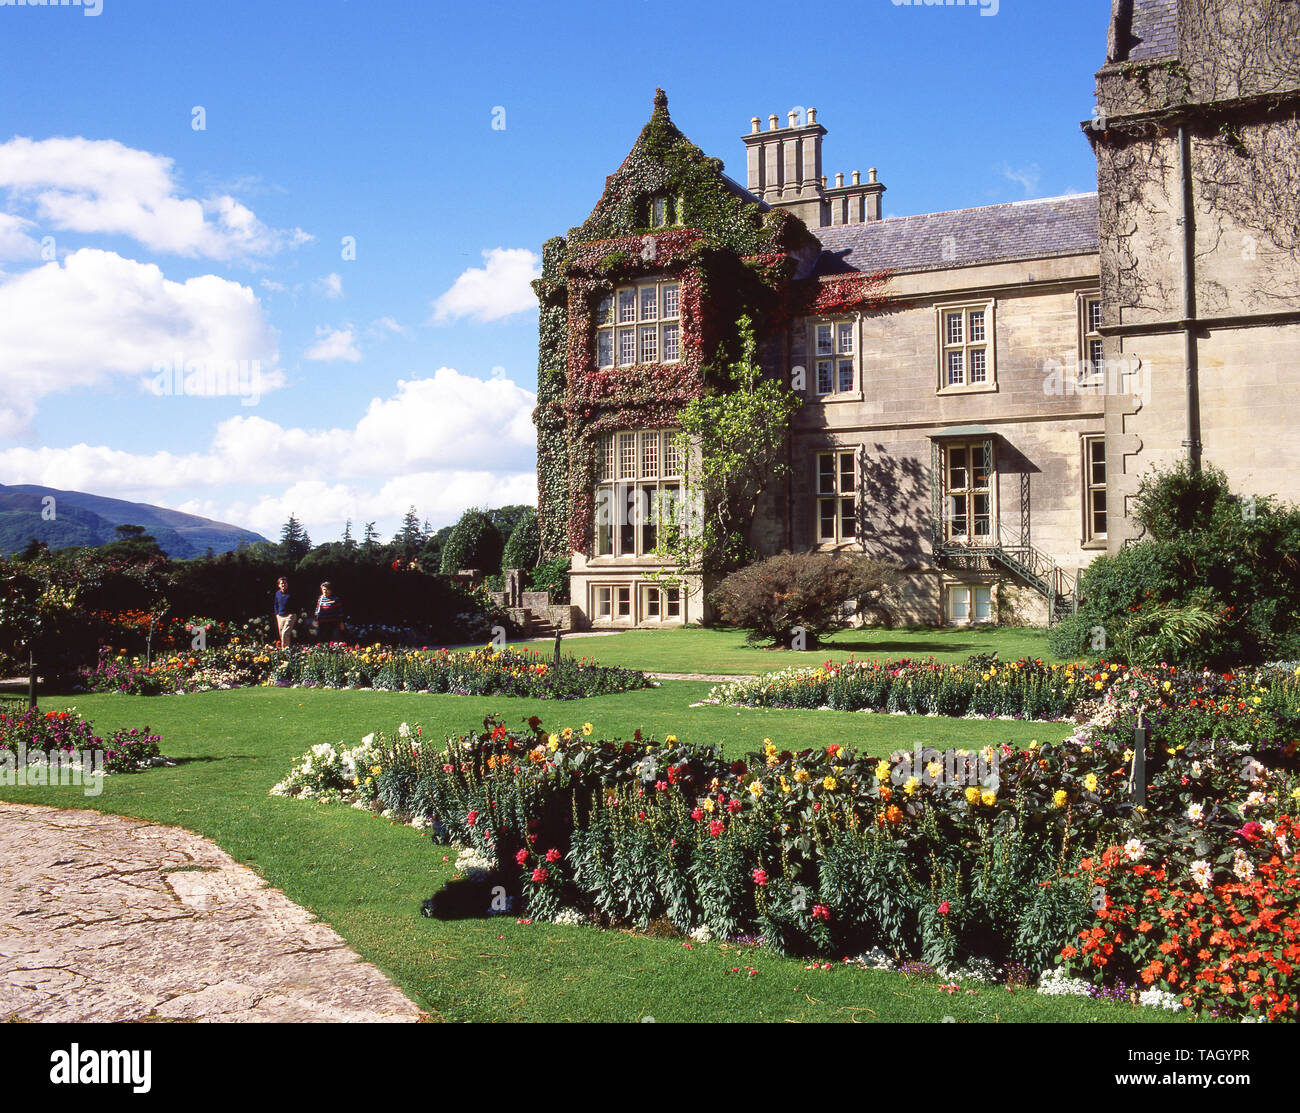 Gardens of Muckross House, Killarney National Park, County Kerry, Munster Province, Republic of Ireland Stock Photo